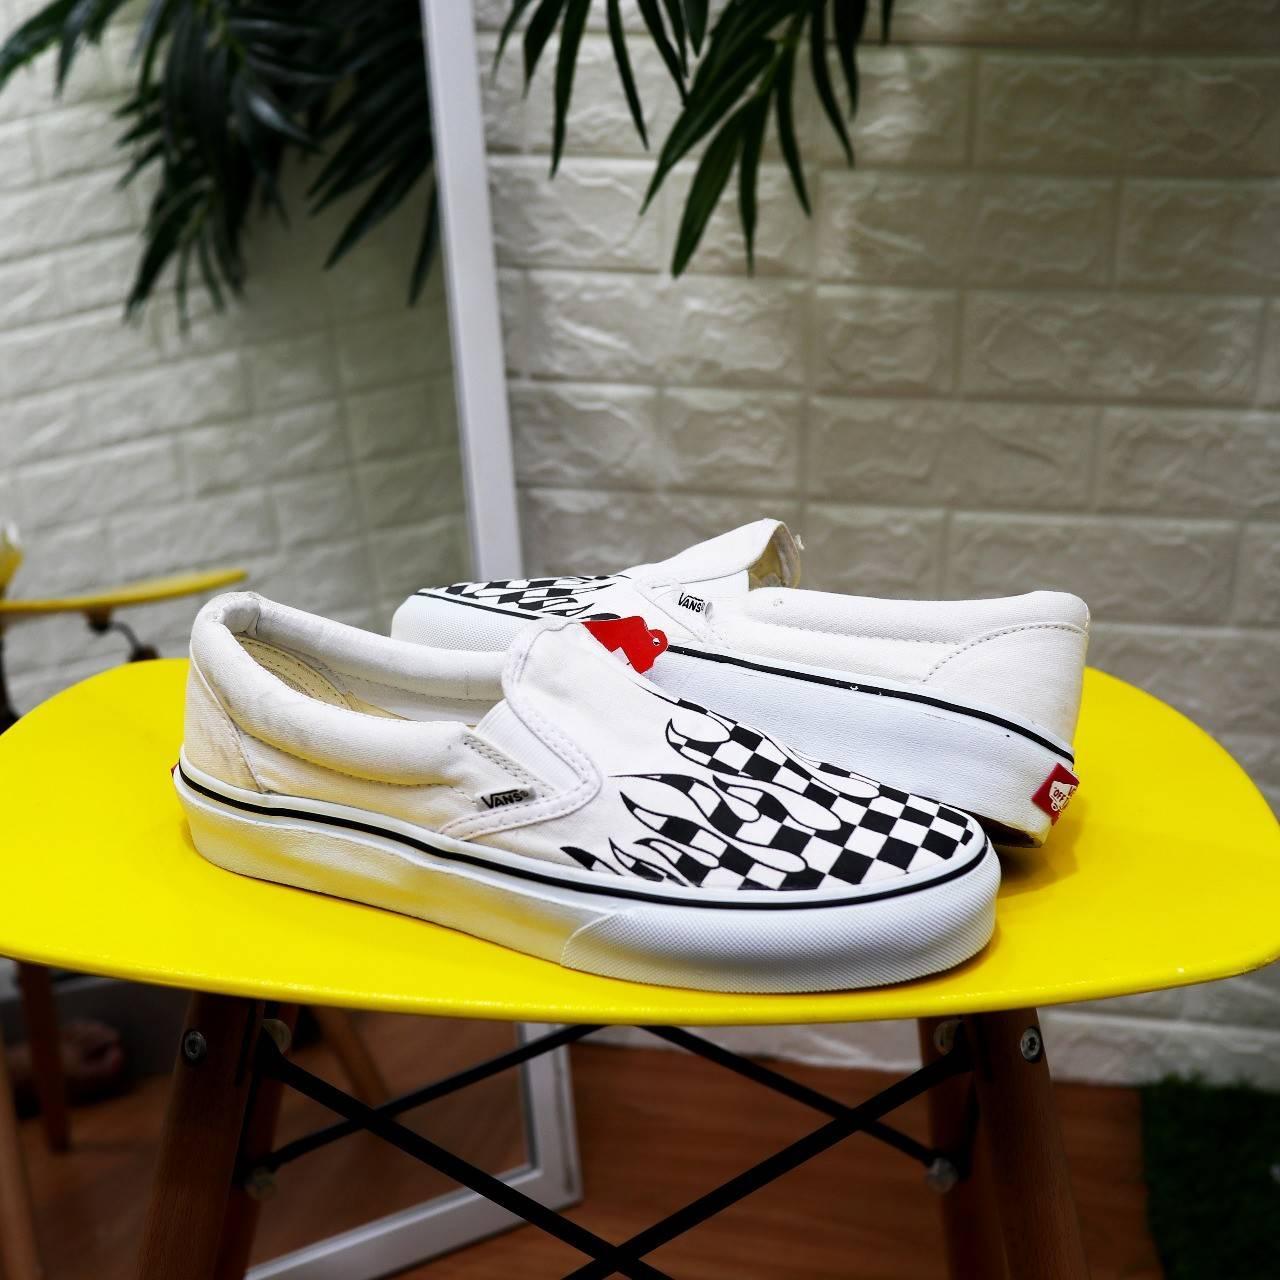 Sepatu Slip On Classic Vans222 Motif Flame / Casual Sneakers Slop Api Off_The_Wall